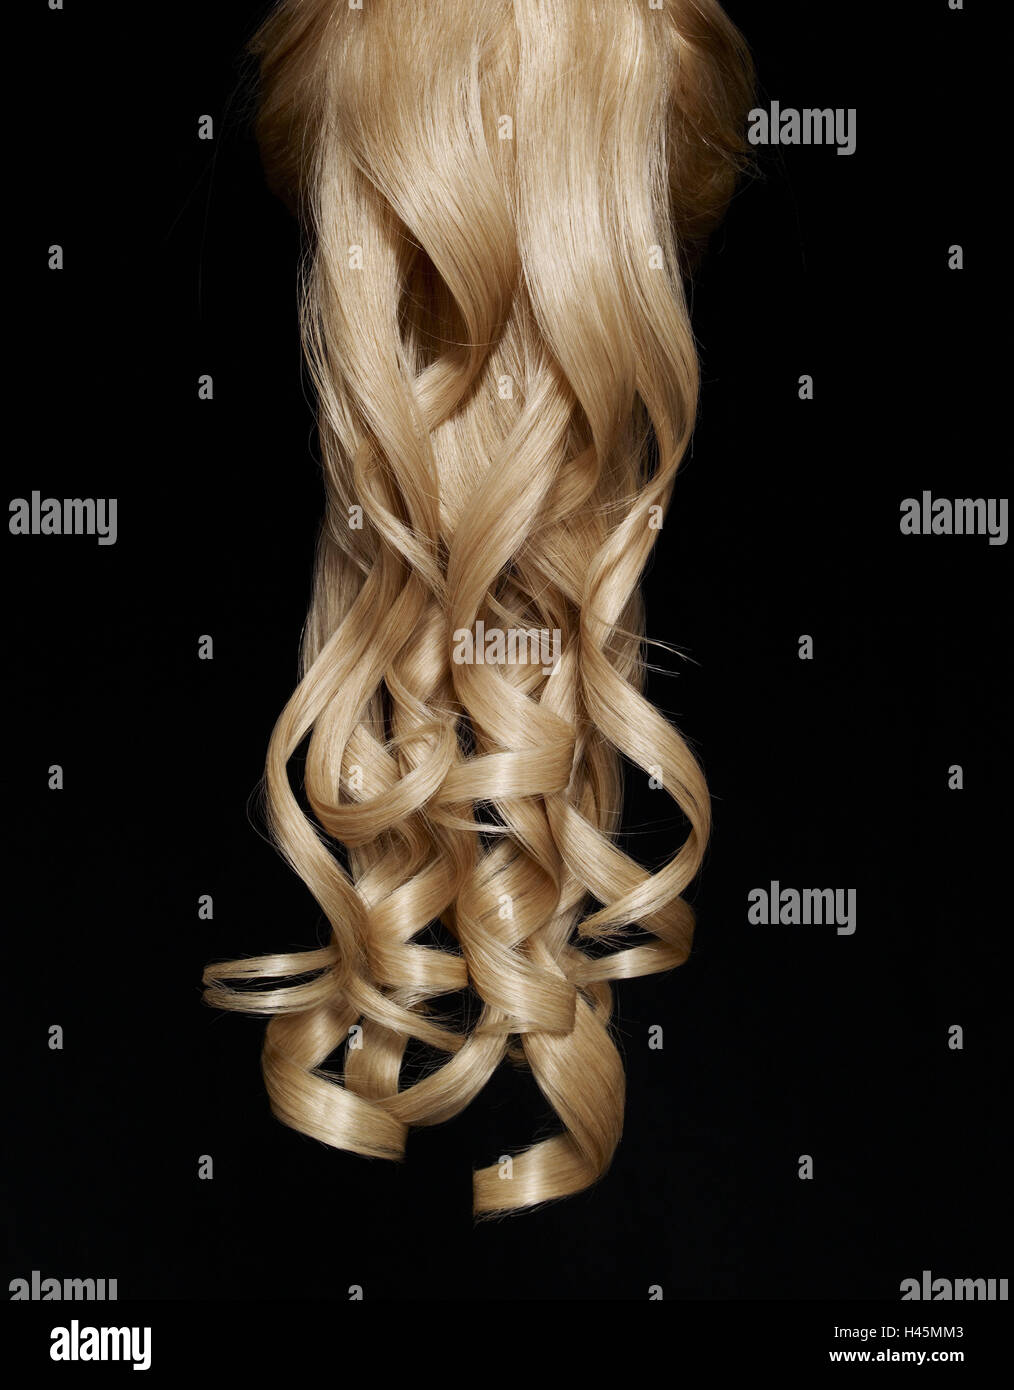 Haare locken lange schwarze 44+ Schwarze